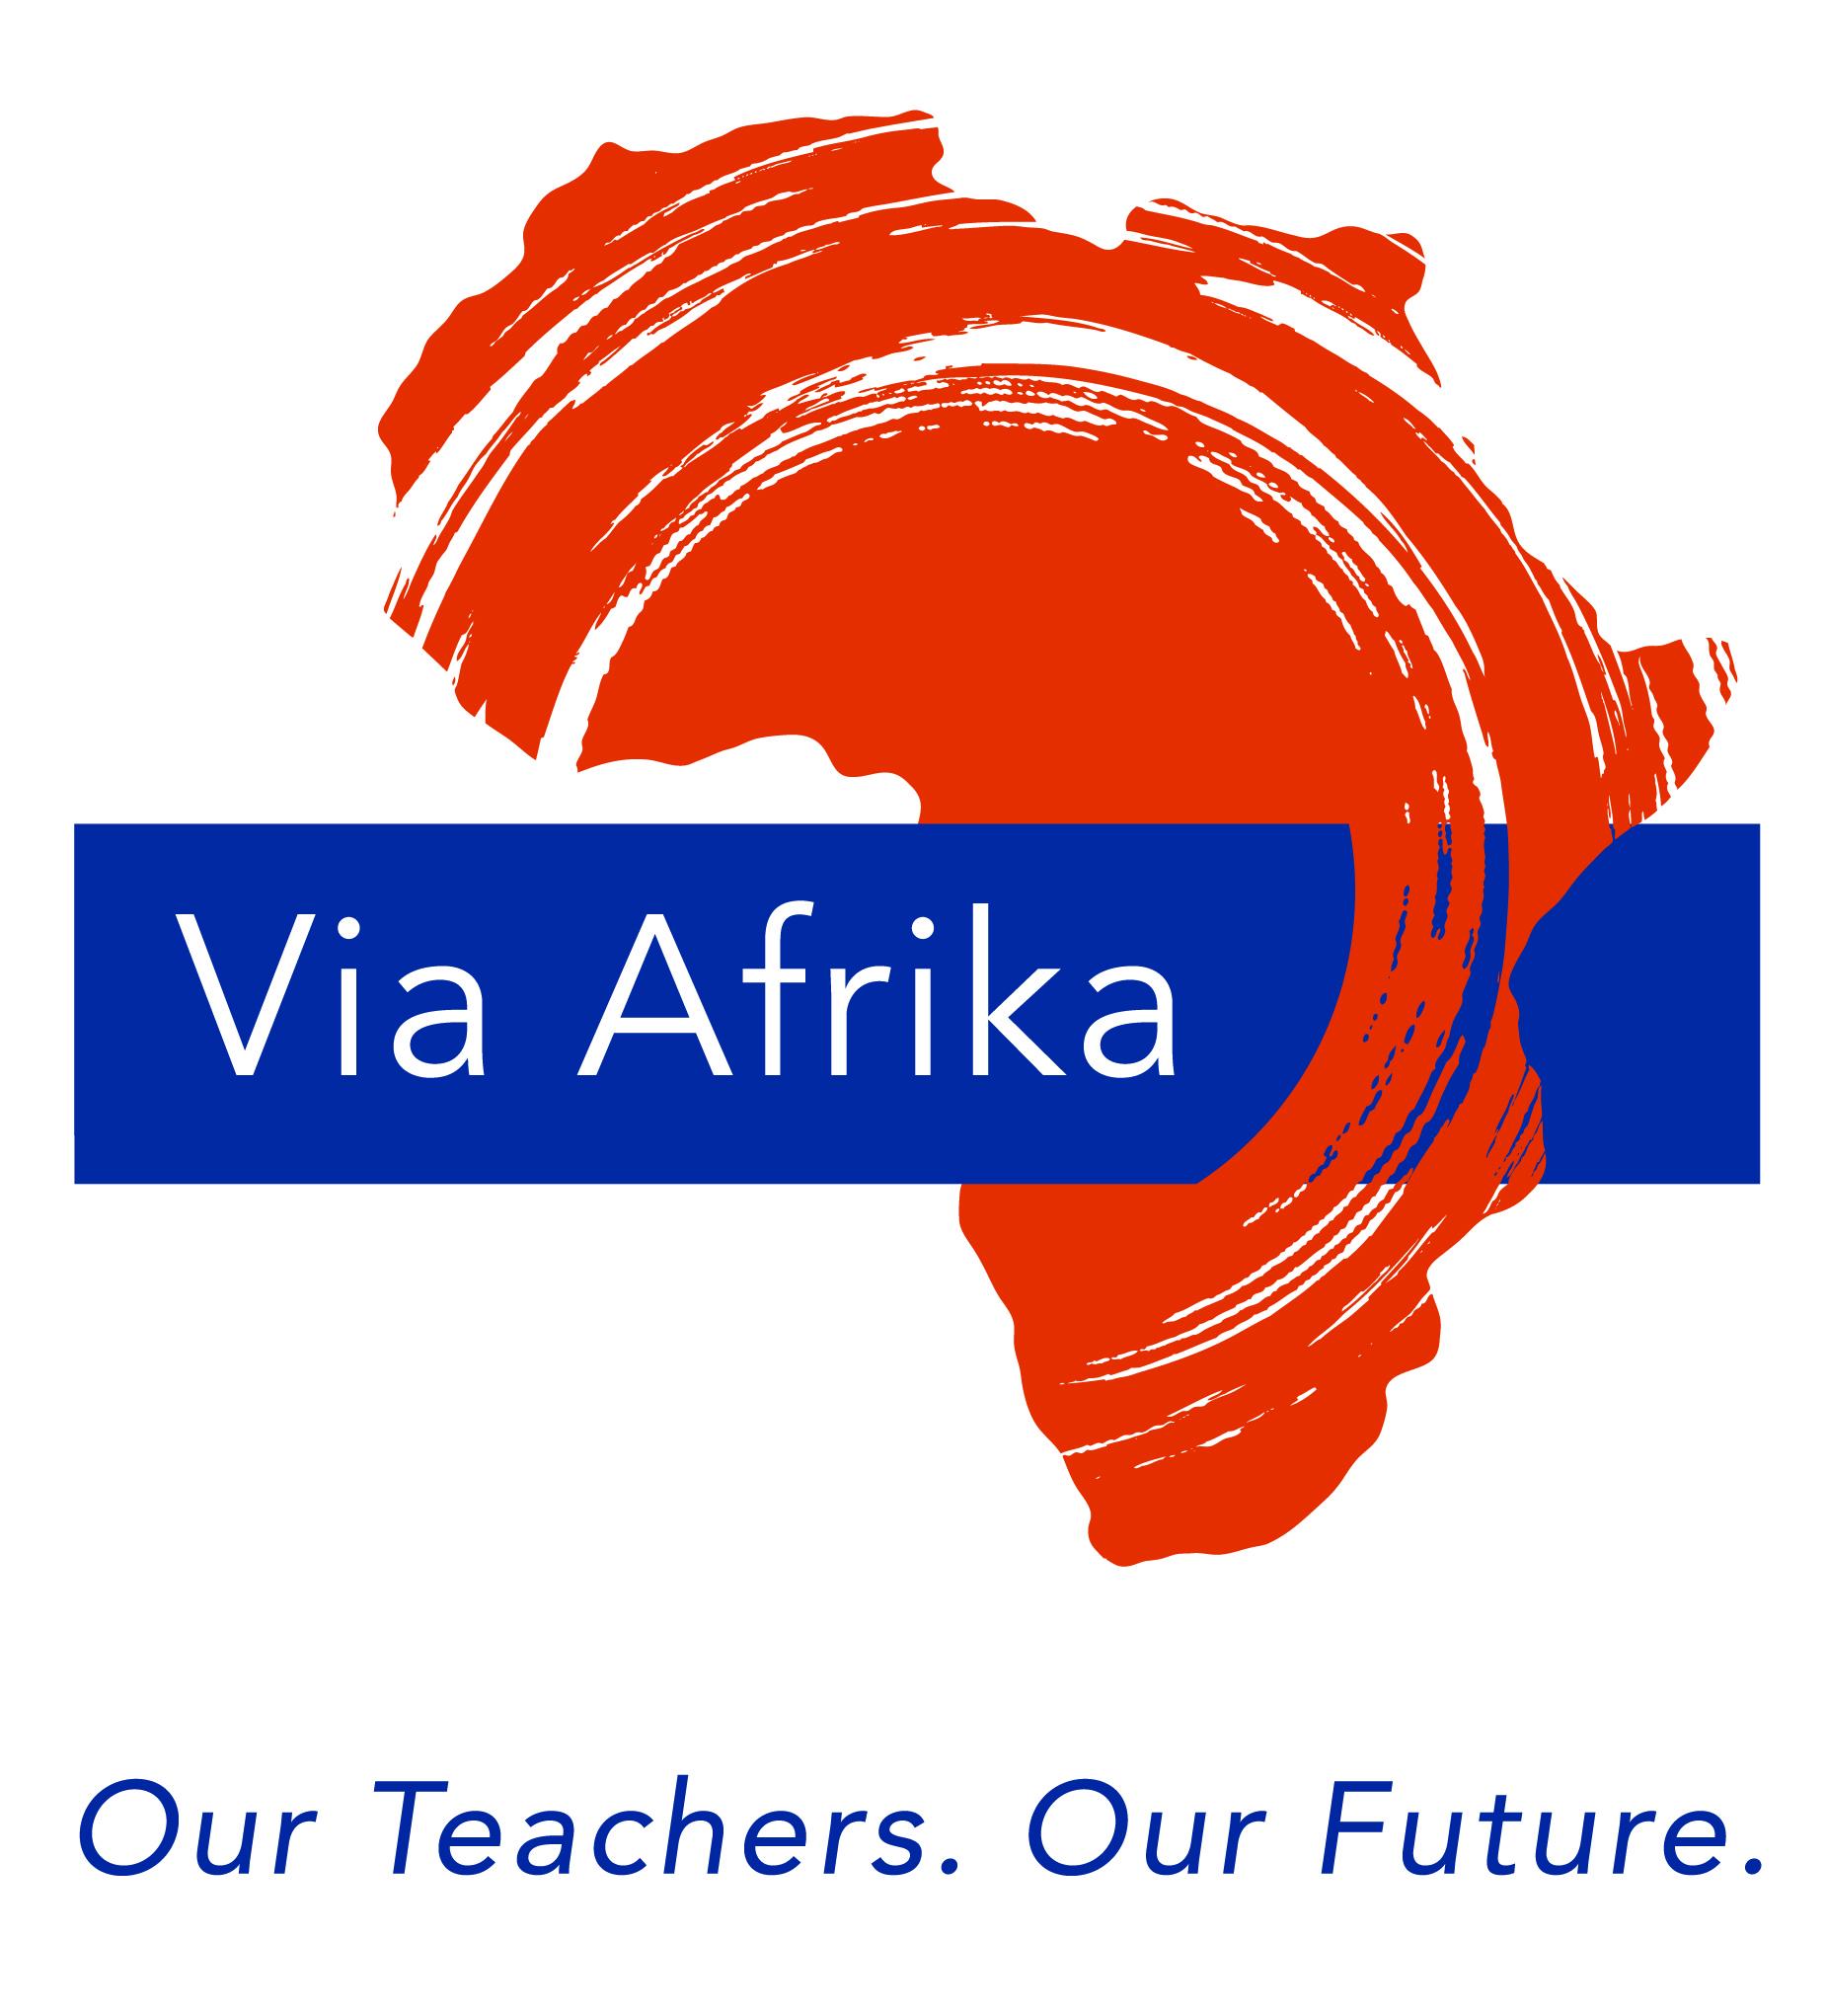 Via Afrika logo